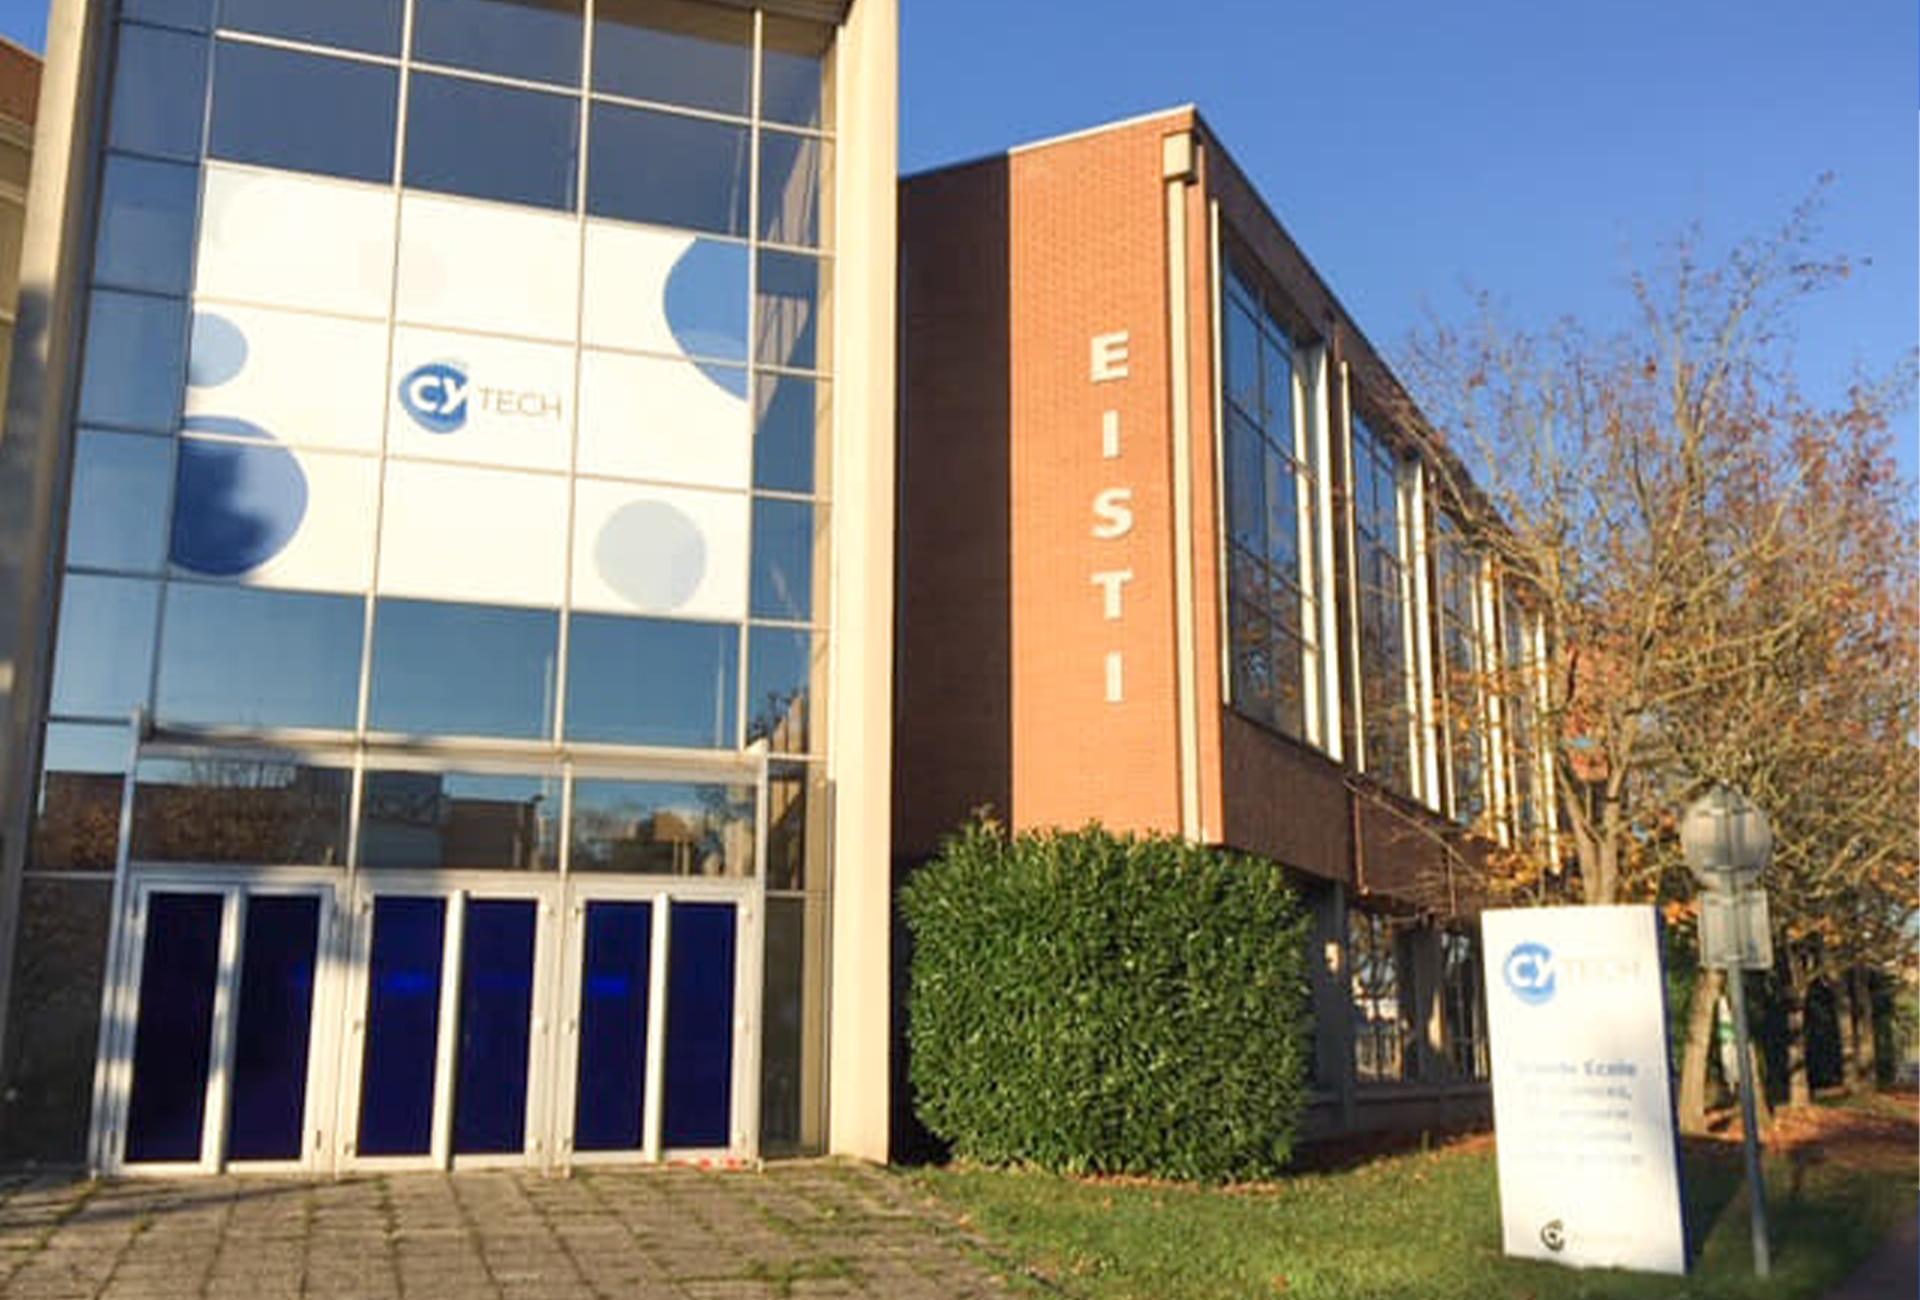 Campus de Cergy CY Tech